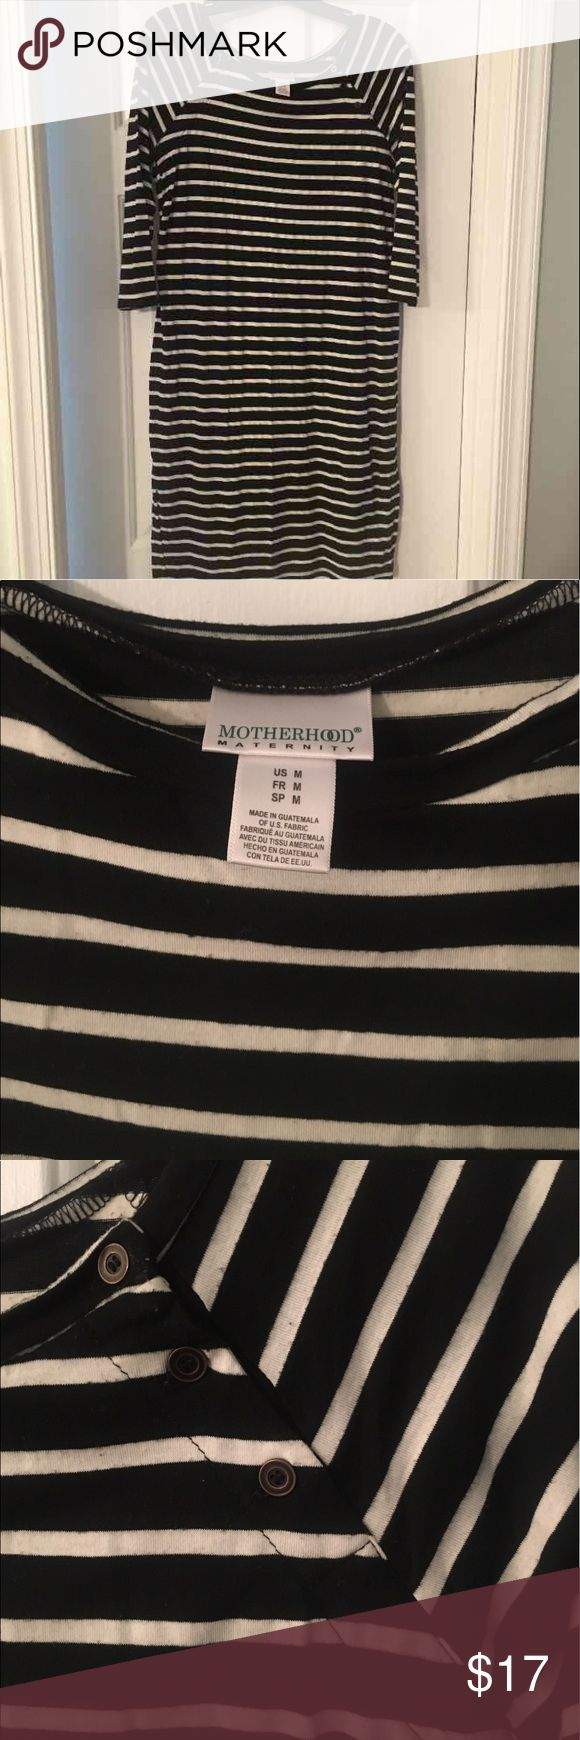 Striped Maternity Dress Size medium. Motherhood maternity brand. Black and white striped with button detail near shoulders. Super flattering. Motherhood Maternity Dresses Midi